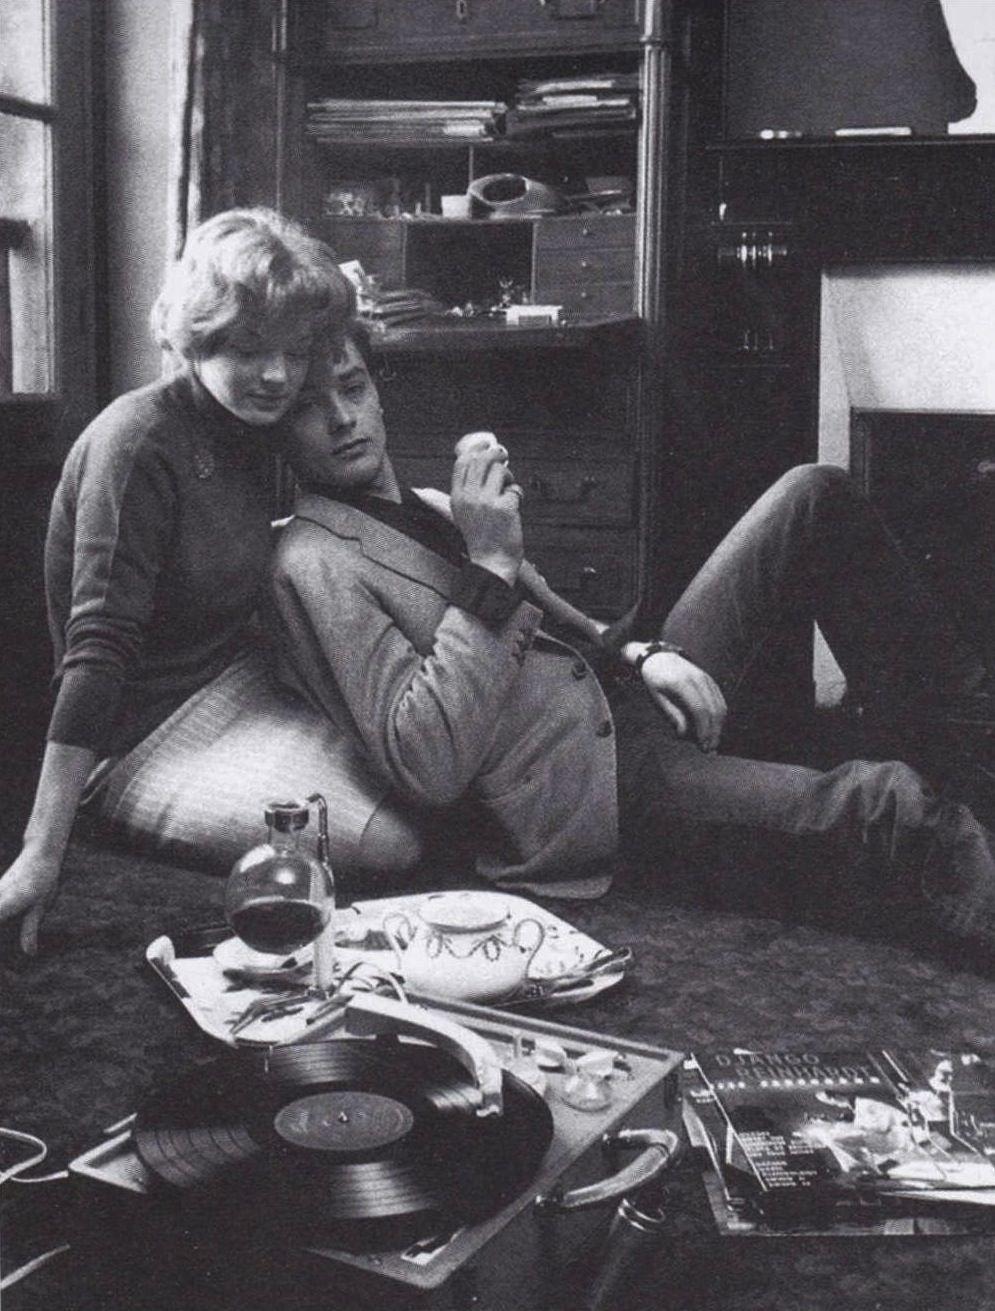 Watch La Piscine Alain Delon Vintage Couples Romy Schneider